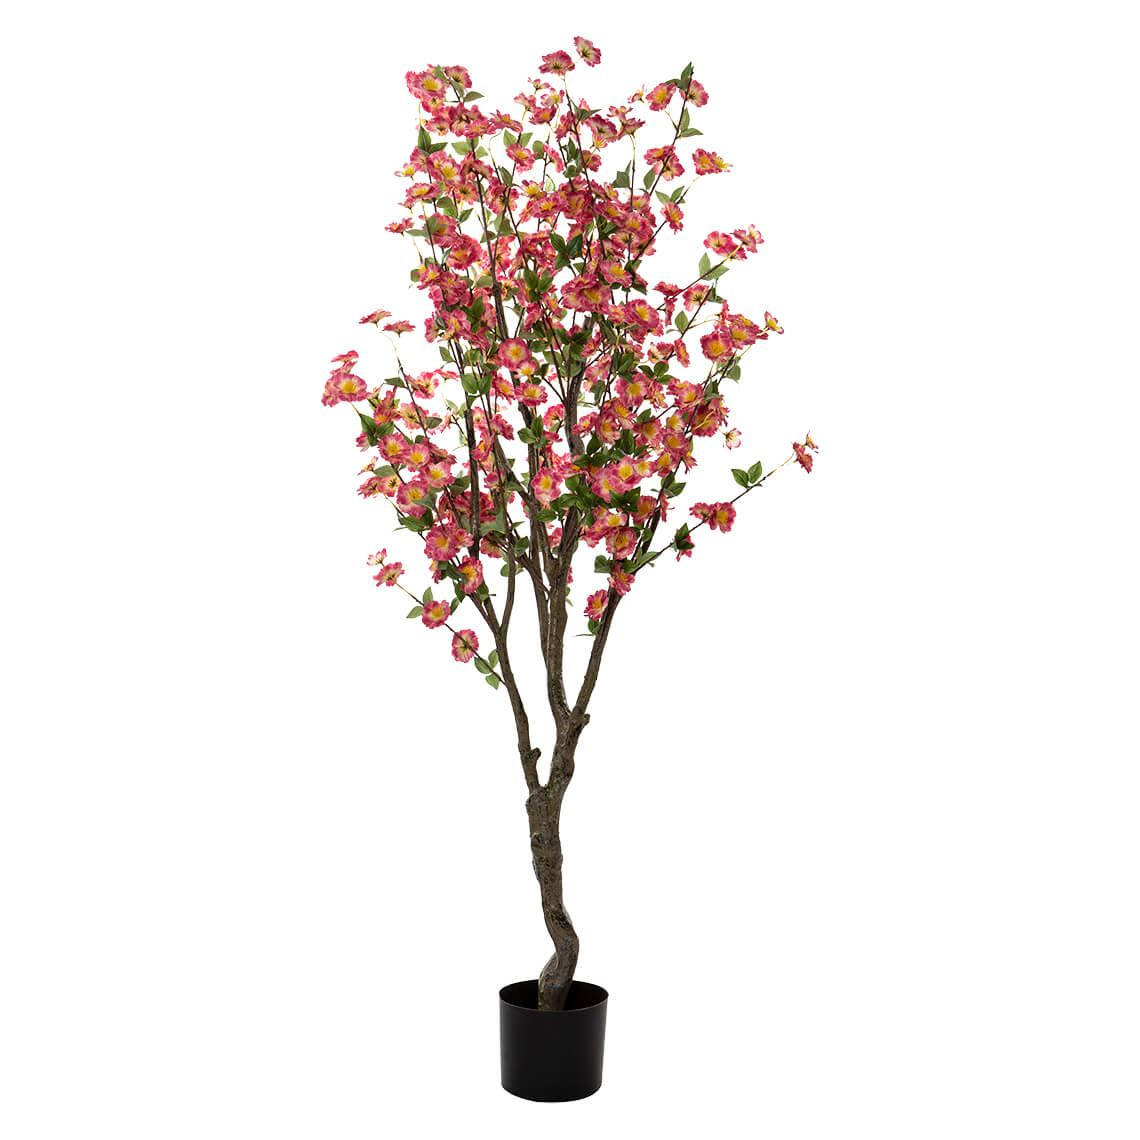 Blossom Tree Size W 70cm x D 70cm x H 150cm in Pink Freedom